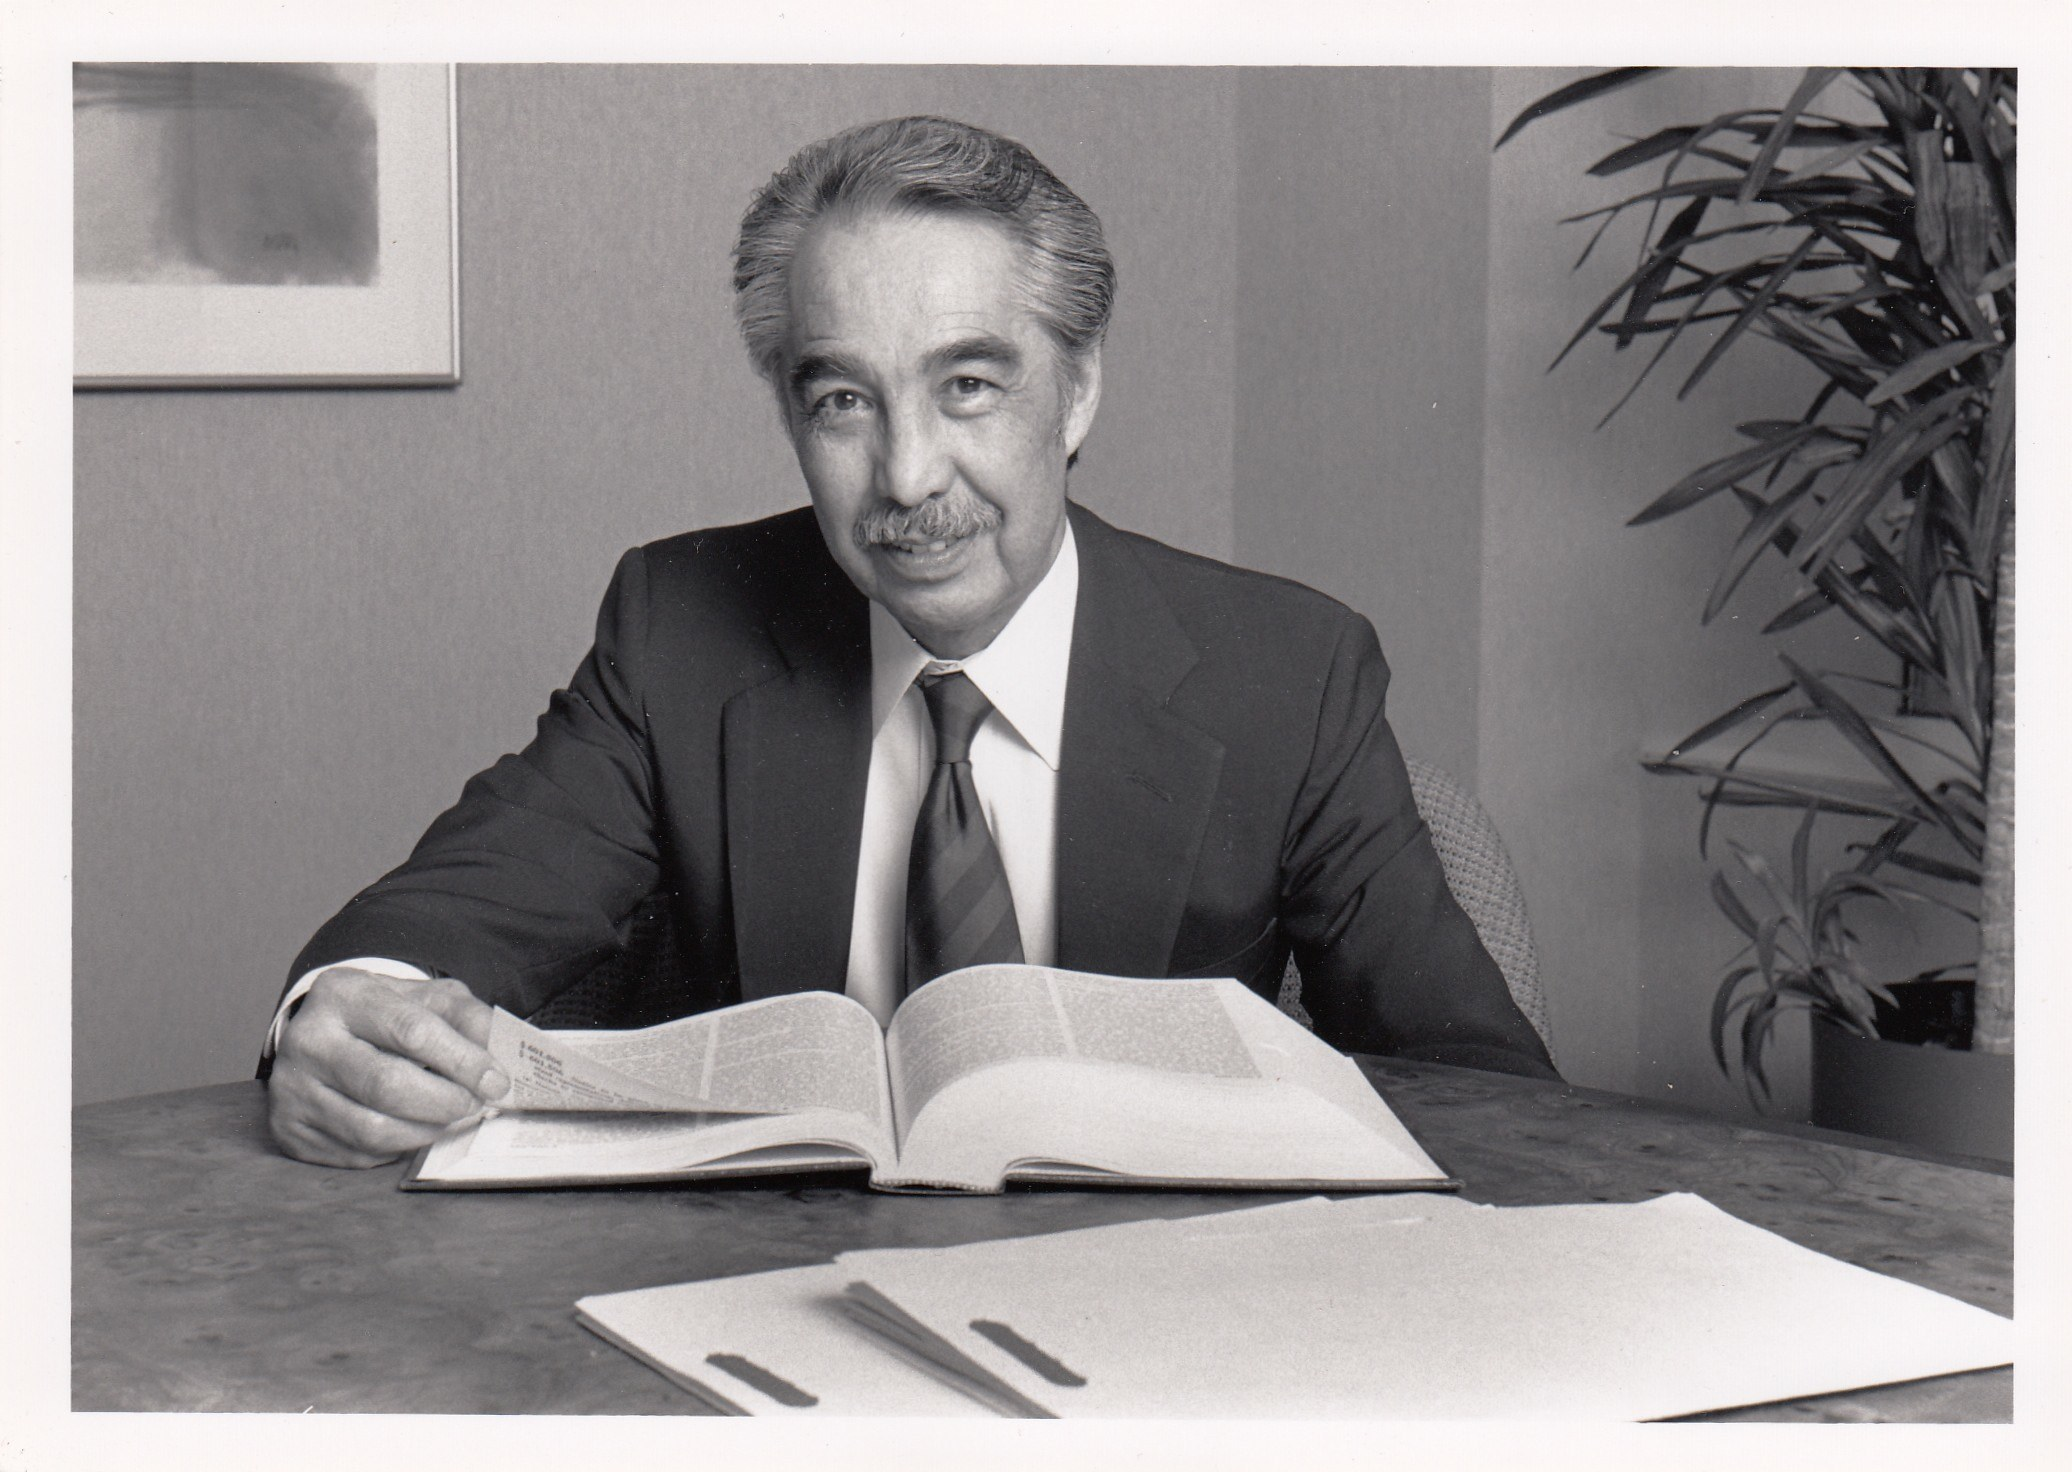 Joseph Mack Montano